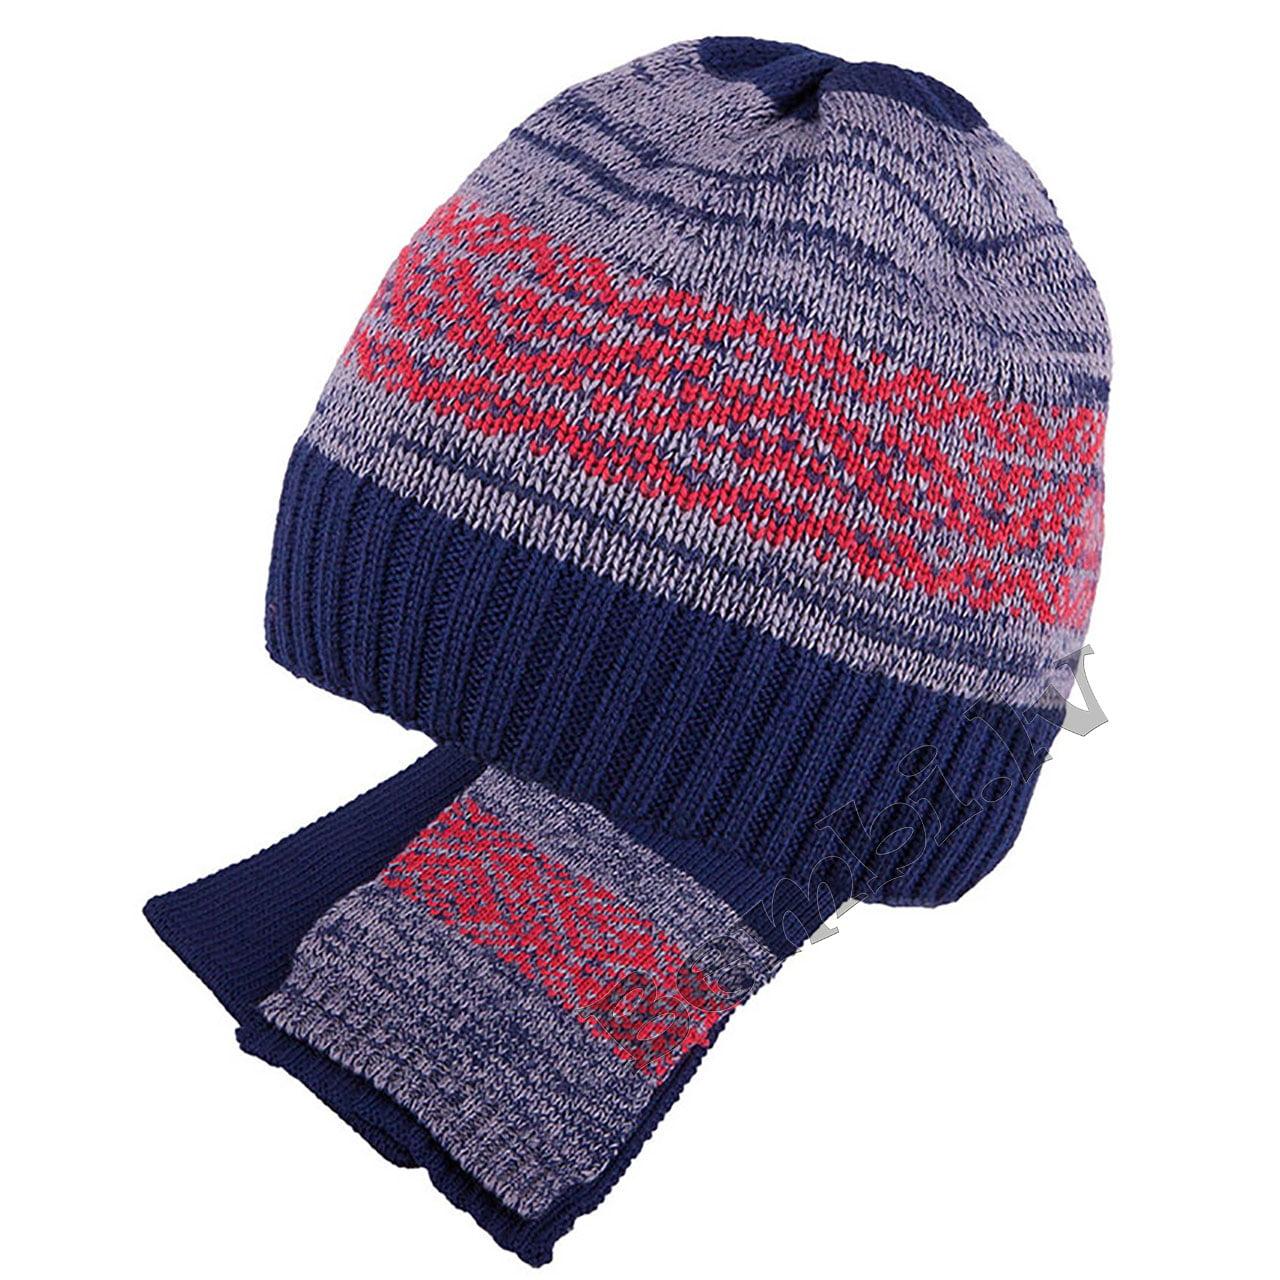 Cepures/šalles